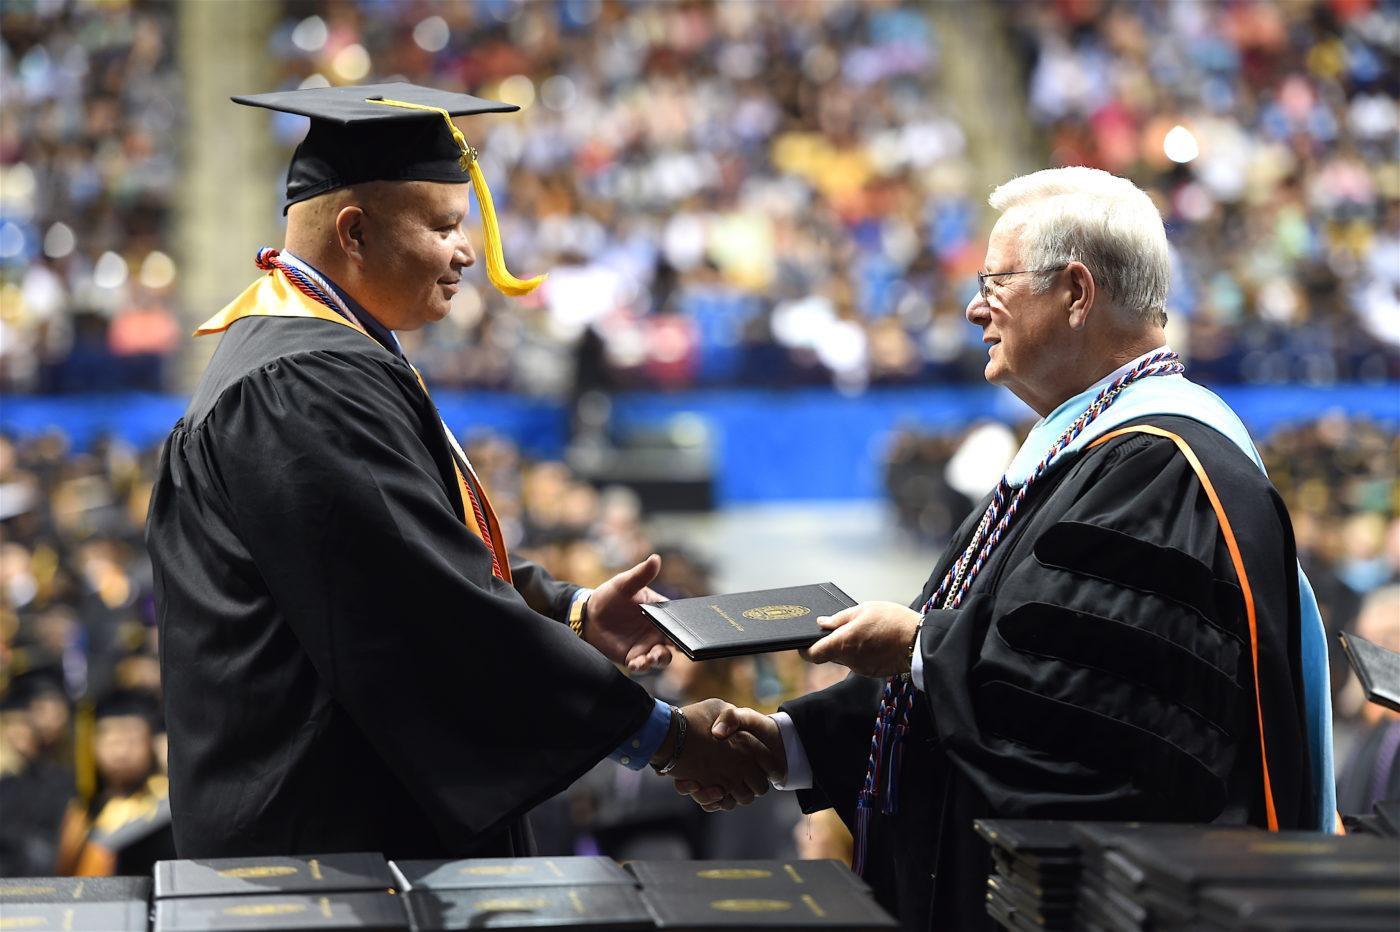 Dr keen veteran student graduation